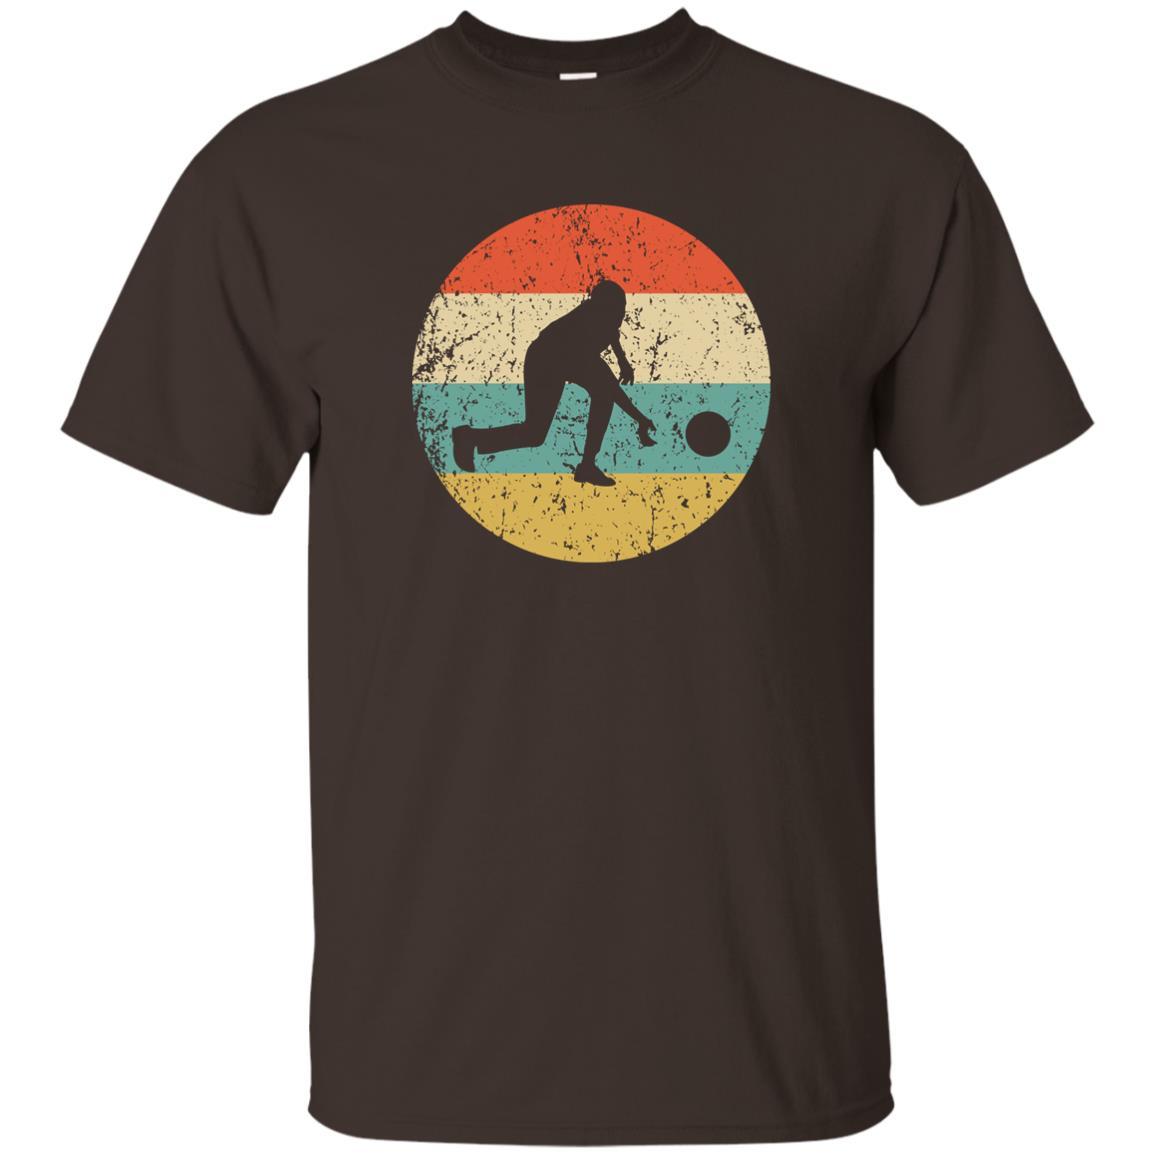 Bowling – Vintage Retro Bowler Unisex Short Sleeve